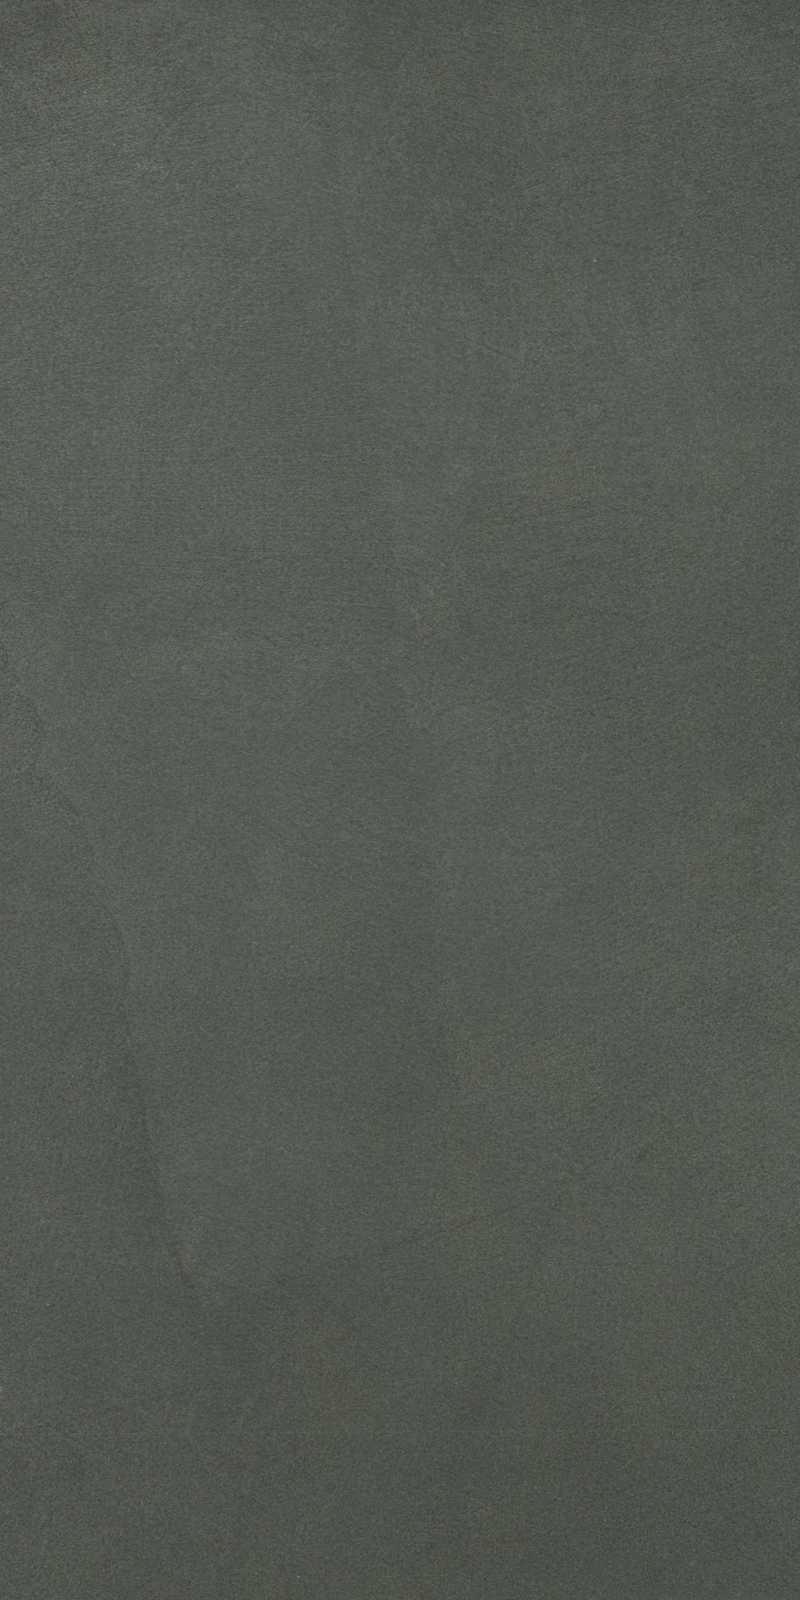 BLOCK   300X600 MOKA - (Euro/Mq 24,89)